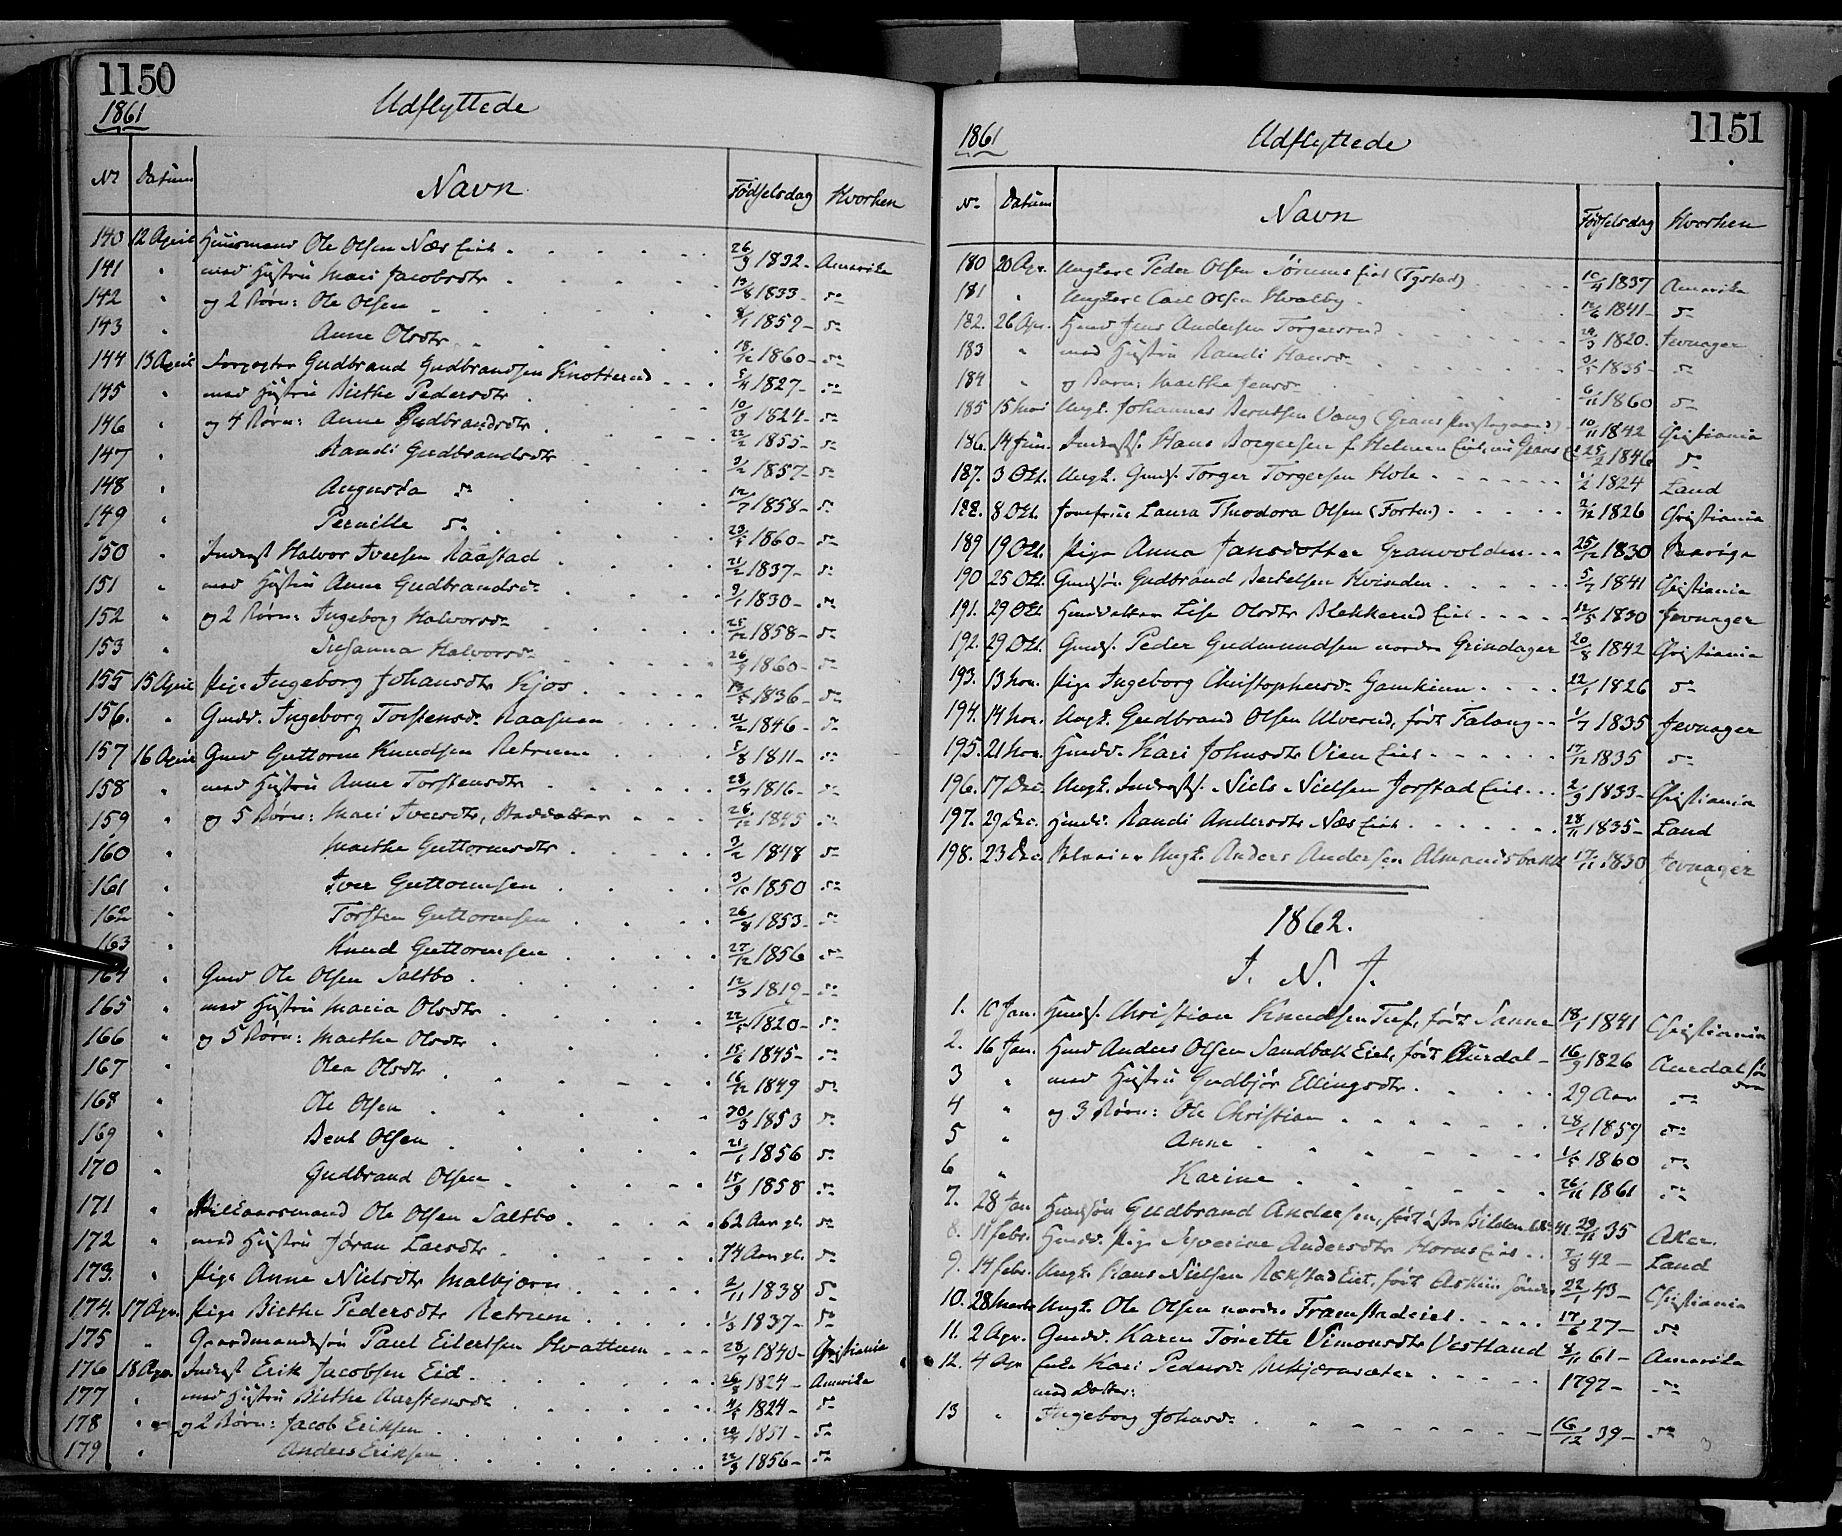 SAH, Gran prestekontor, Ministerialbok nr. 12, 1856-1874, s. 1150-1151